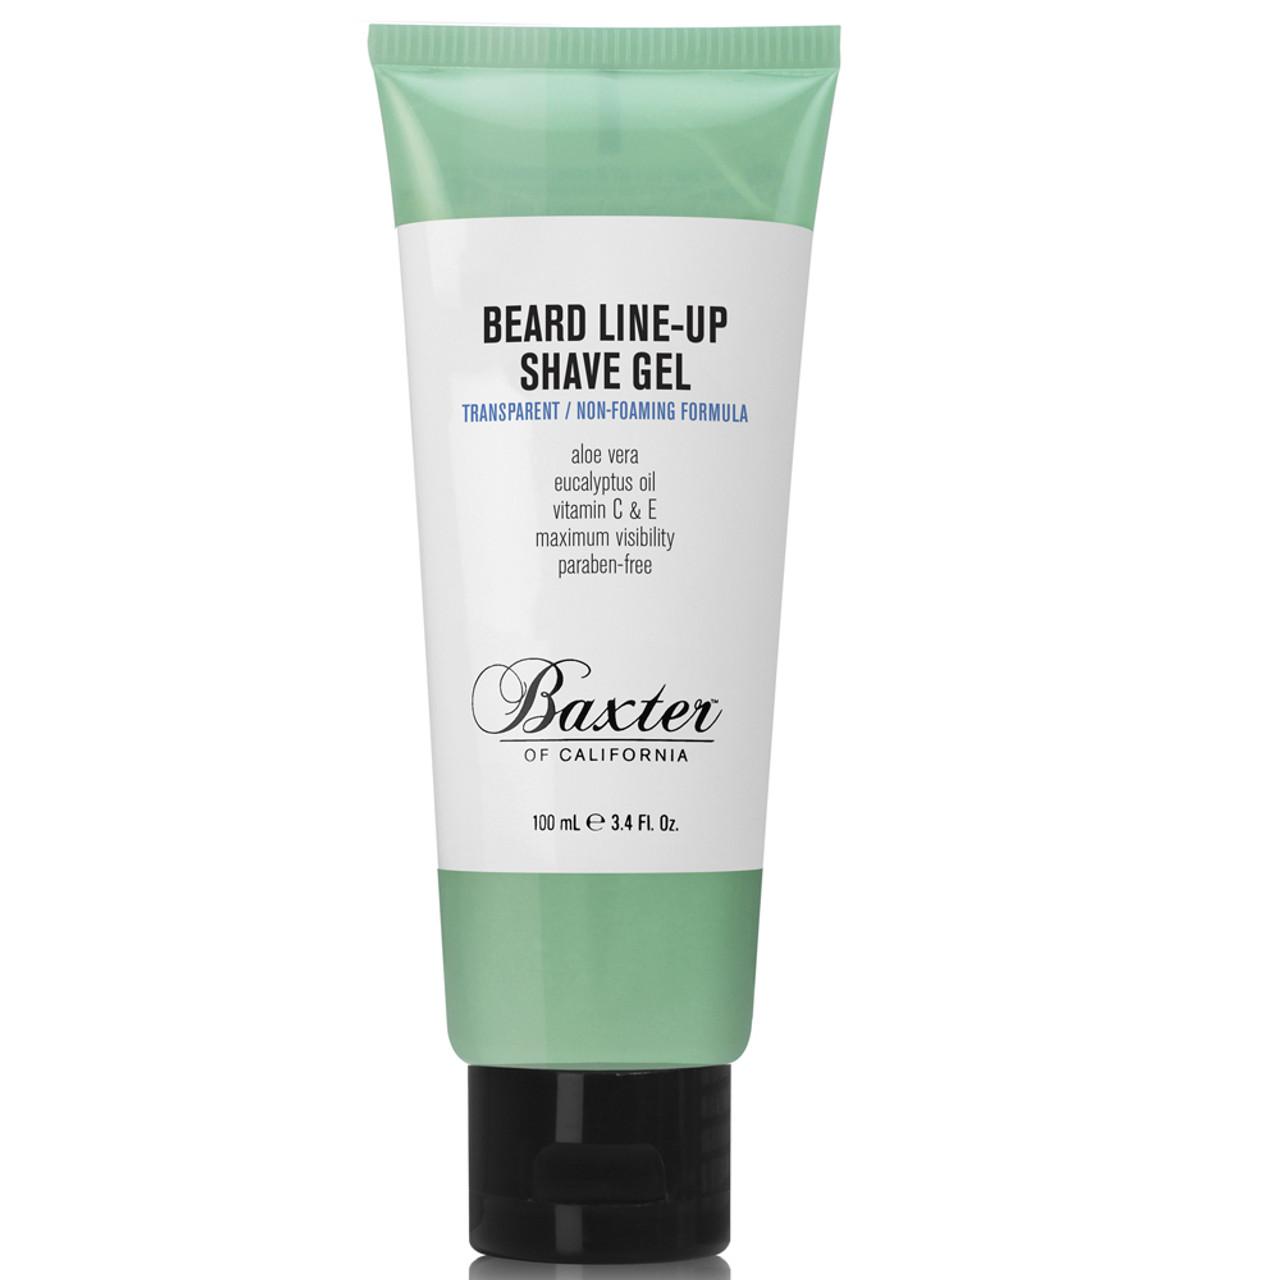 Baxter of California Beard Line-Up Shave Gel